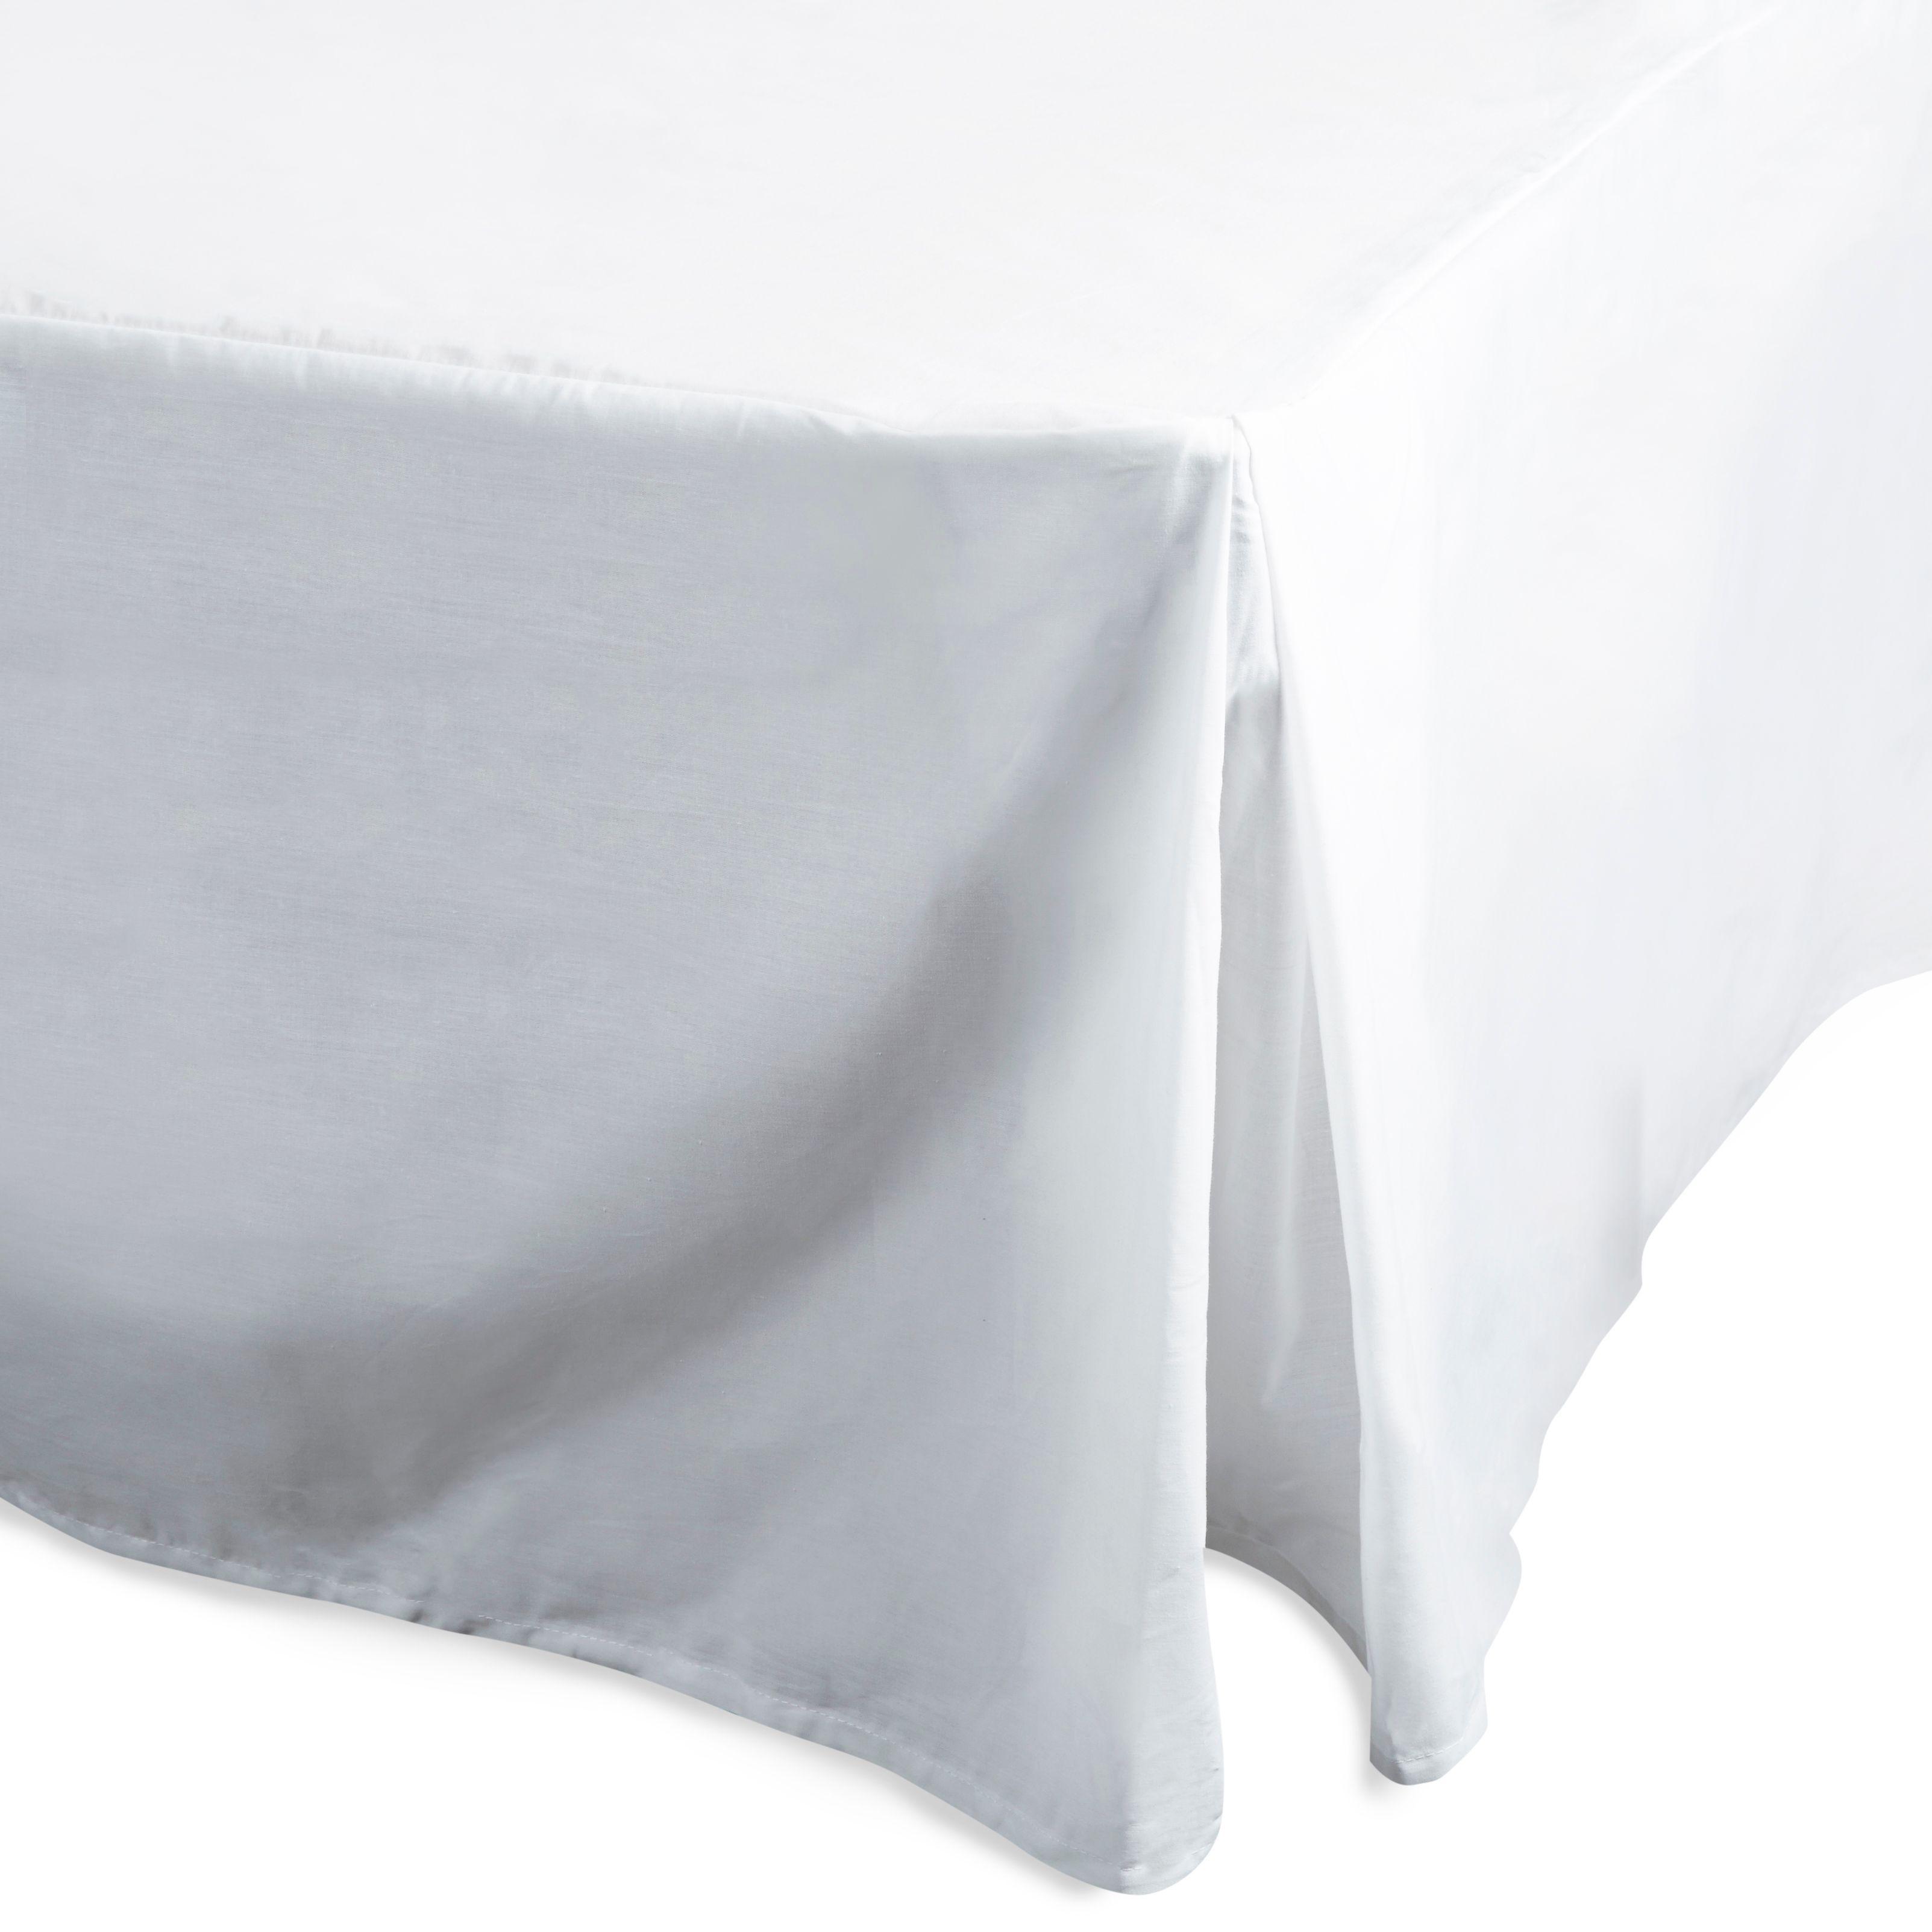 Chartwell Plain Dye White King Size Percale Pleat Valance Sheet